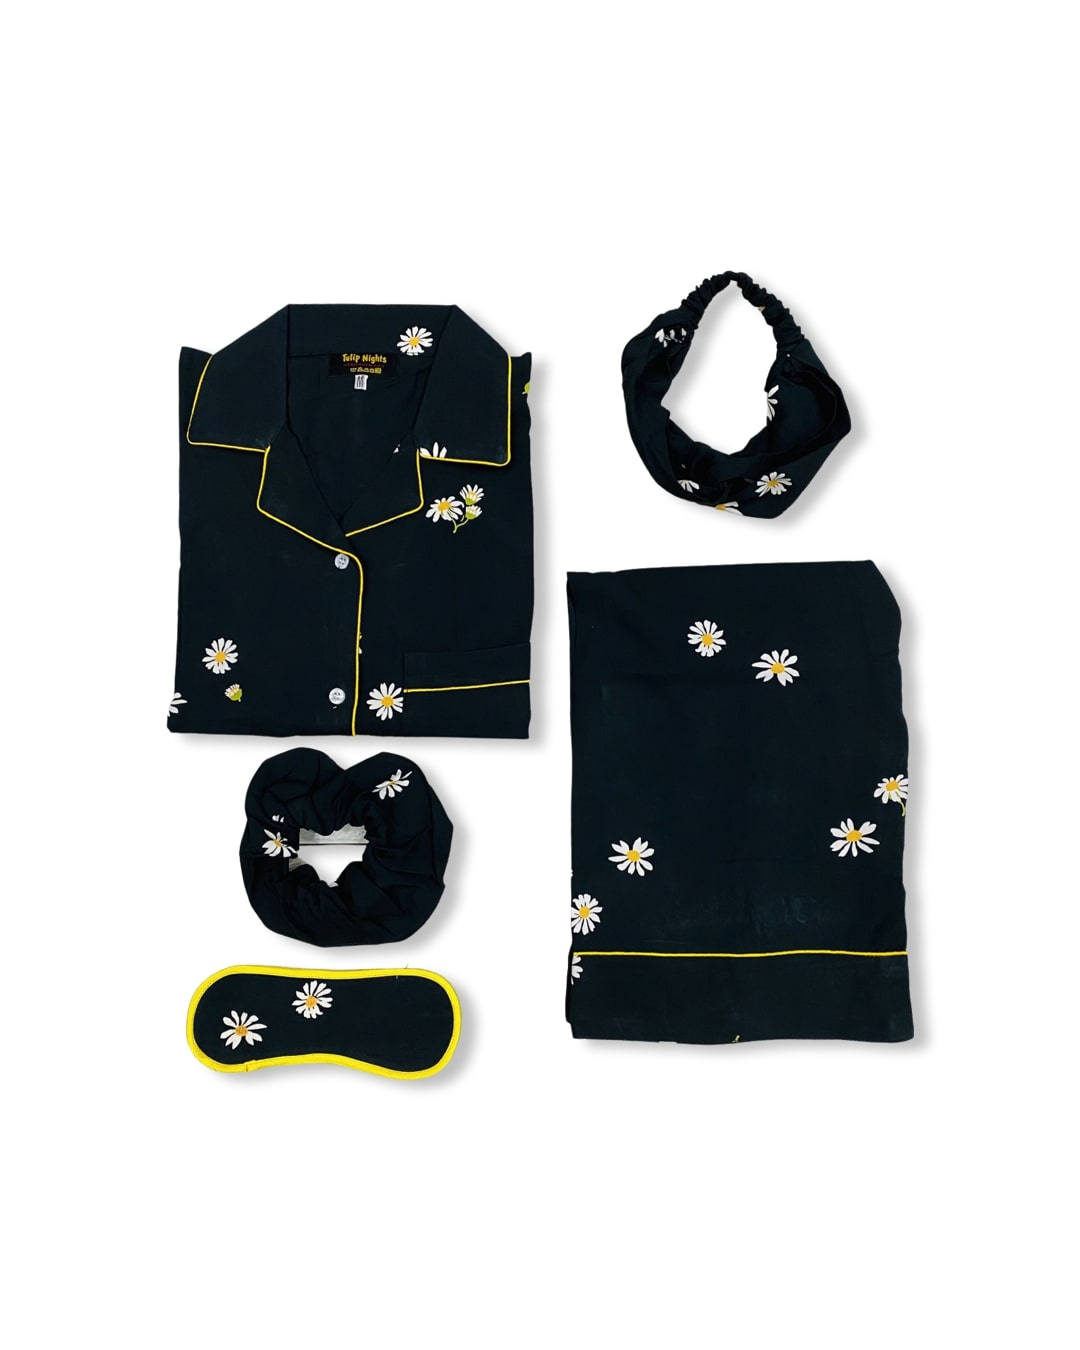 2PC Pyjamas Set BK-500031